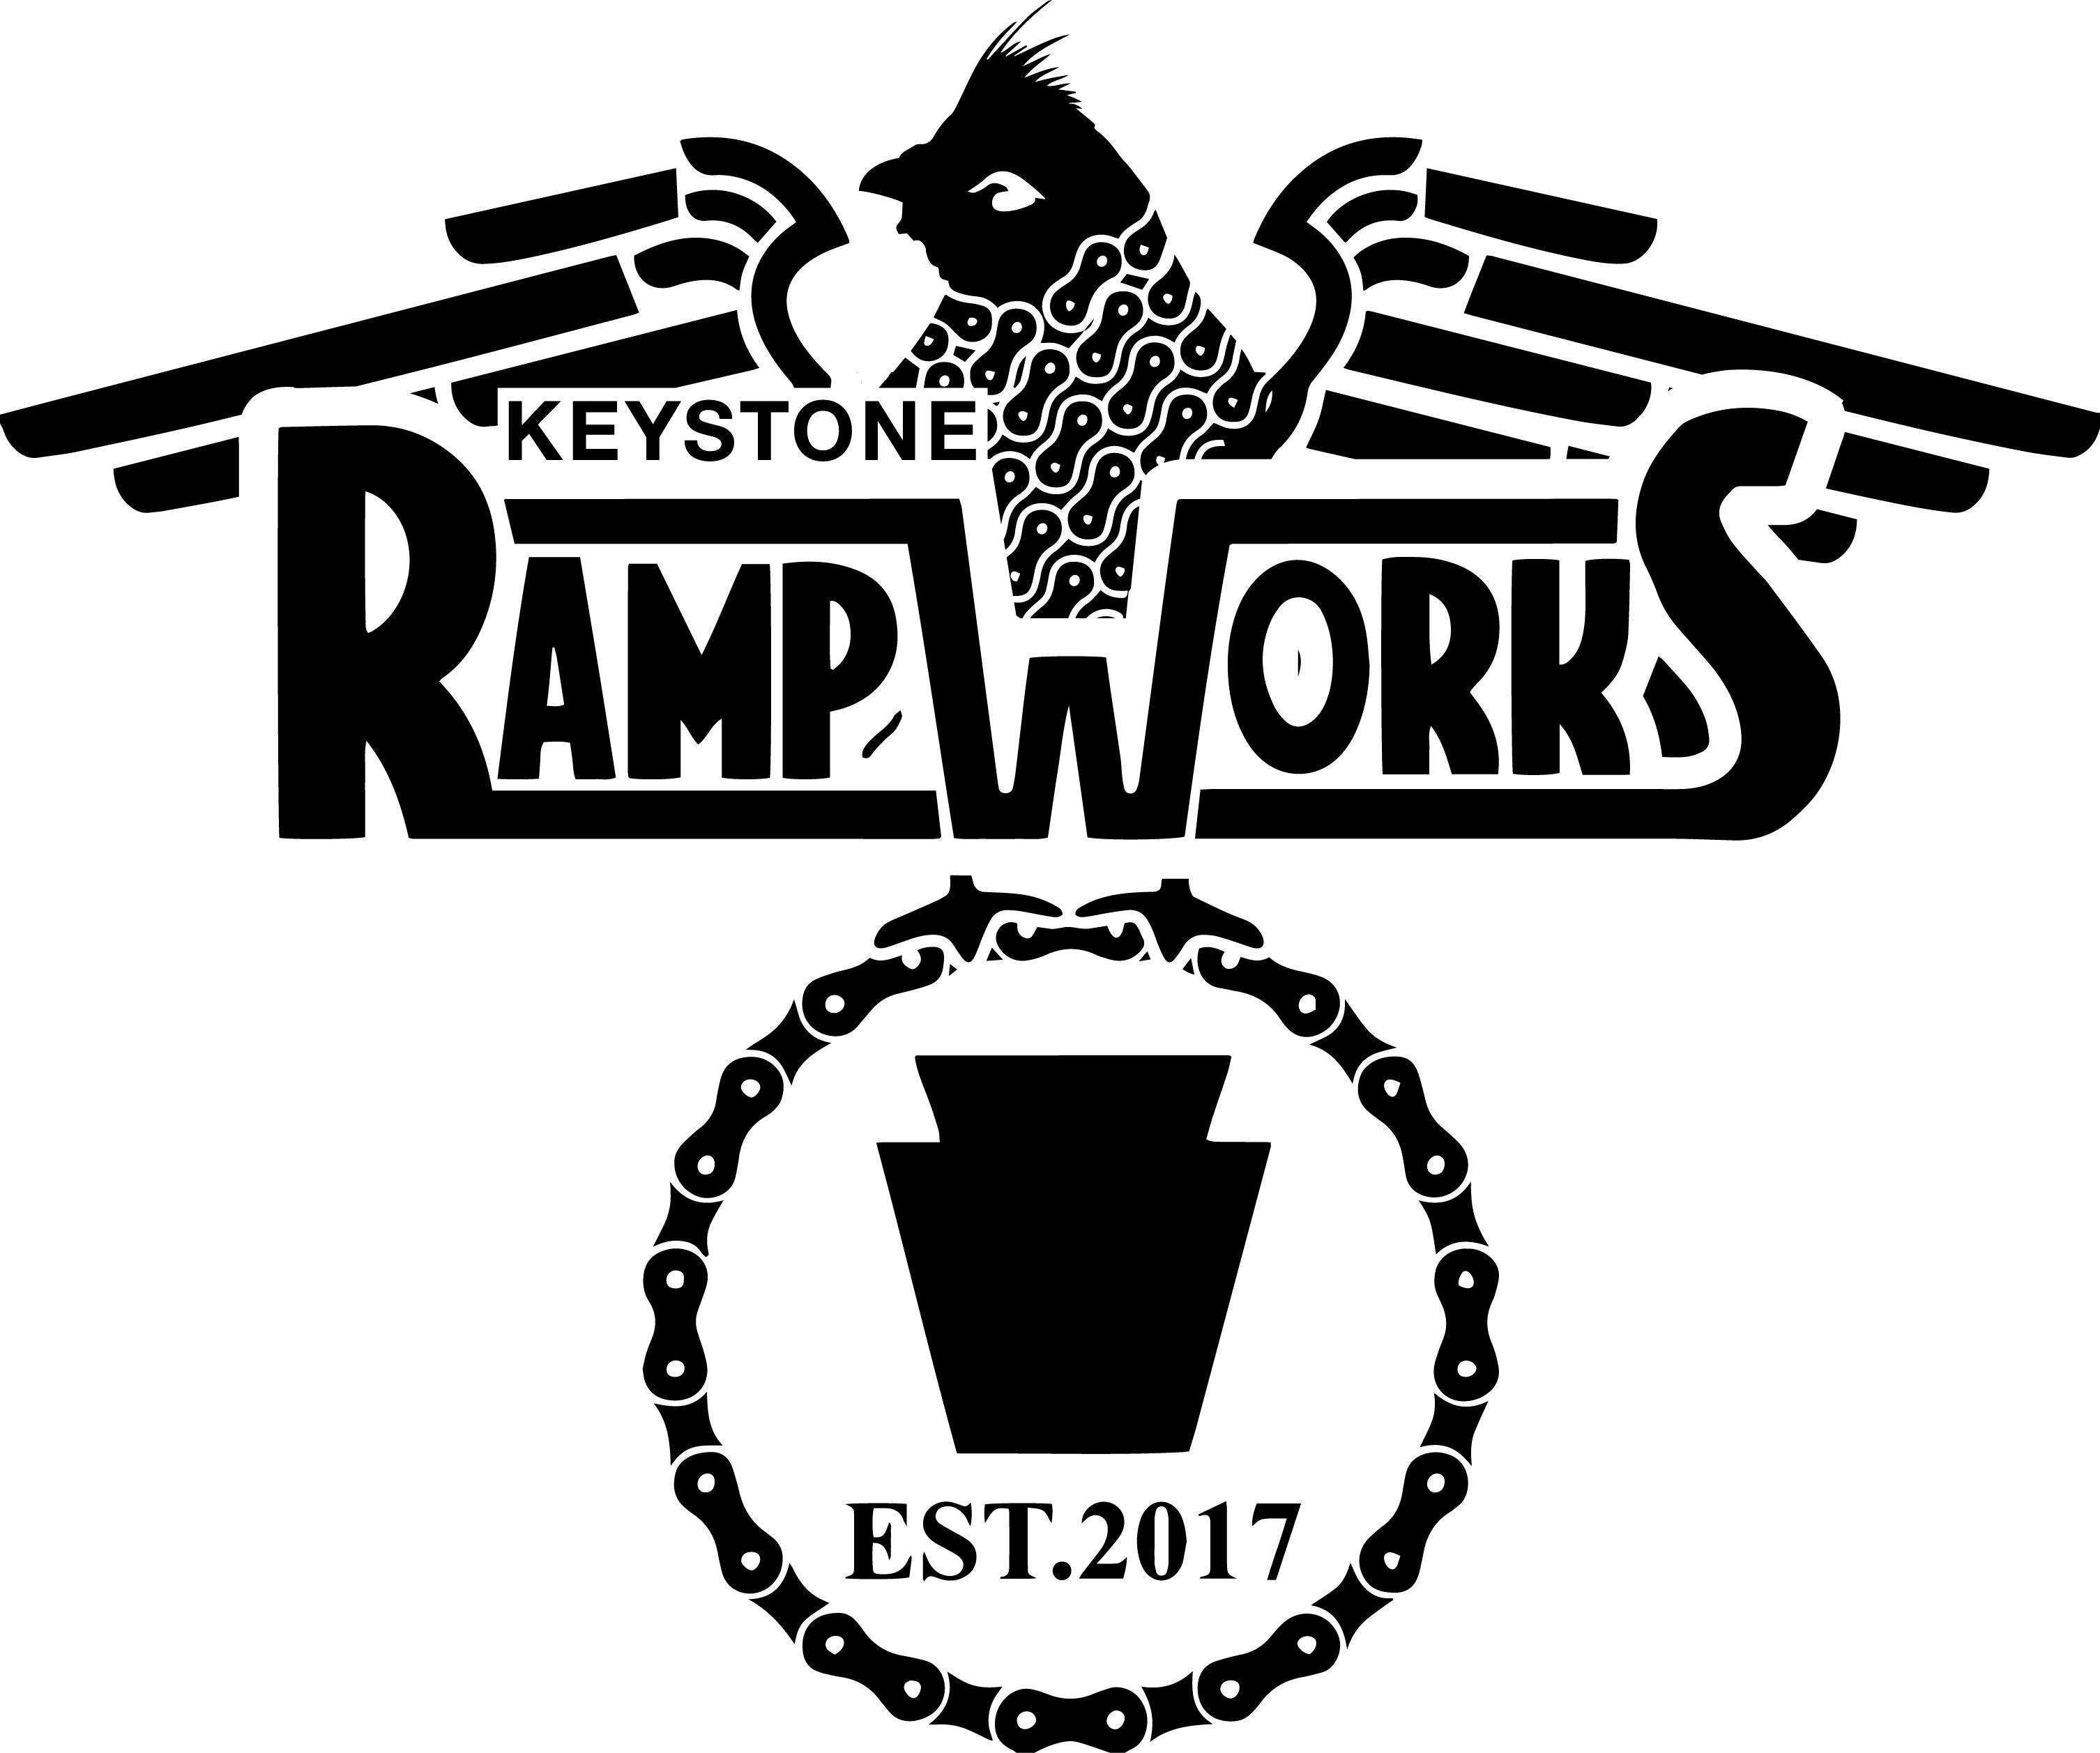 Keystone Rampworks LLC